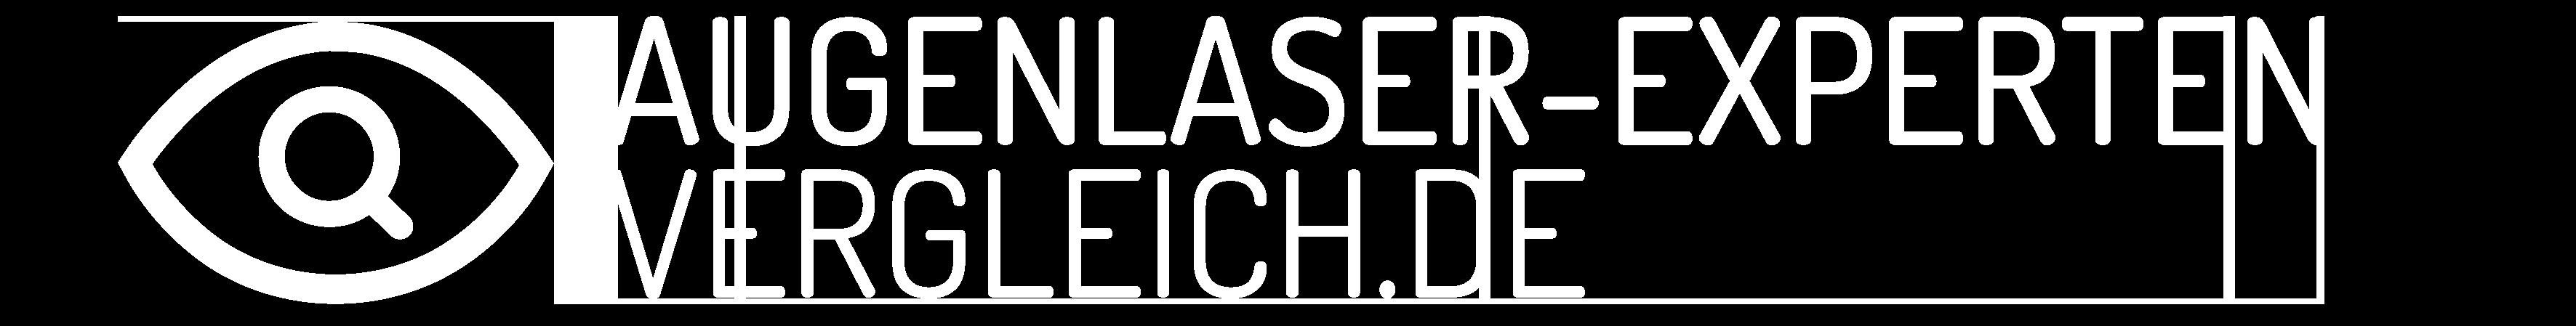 Augenlaser-Experten-Vergleich.de